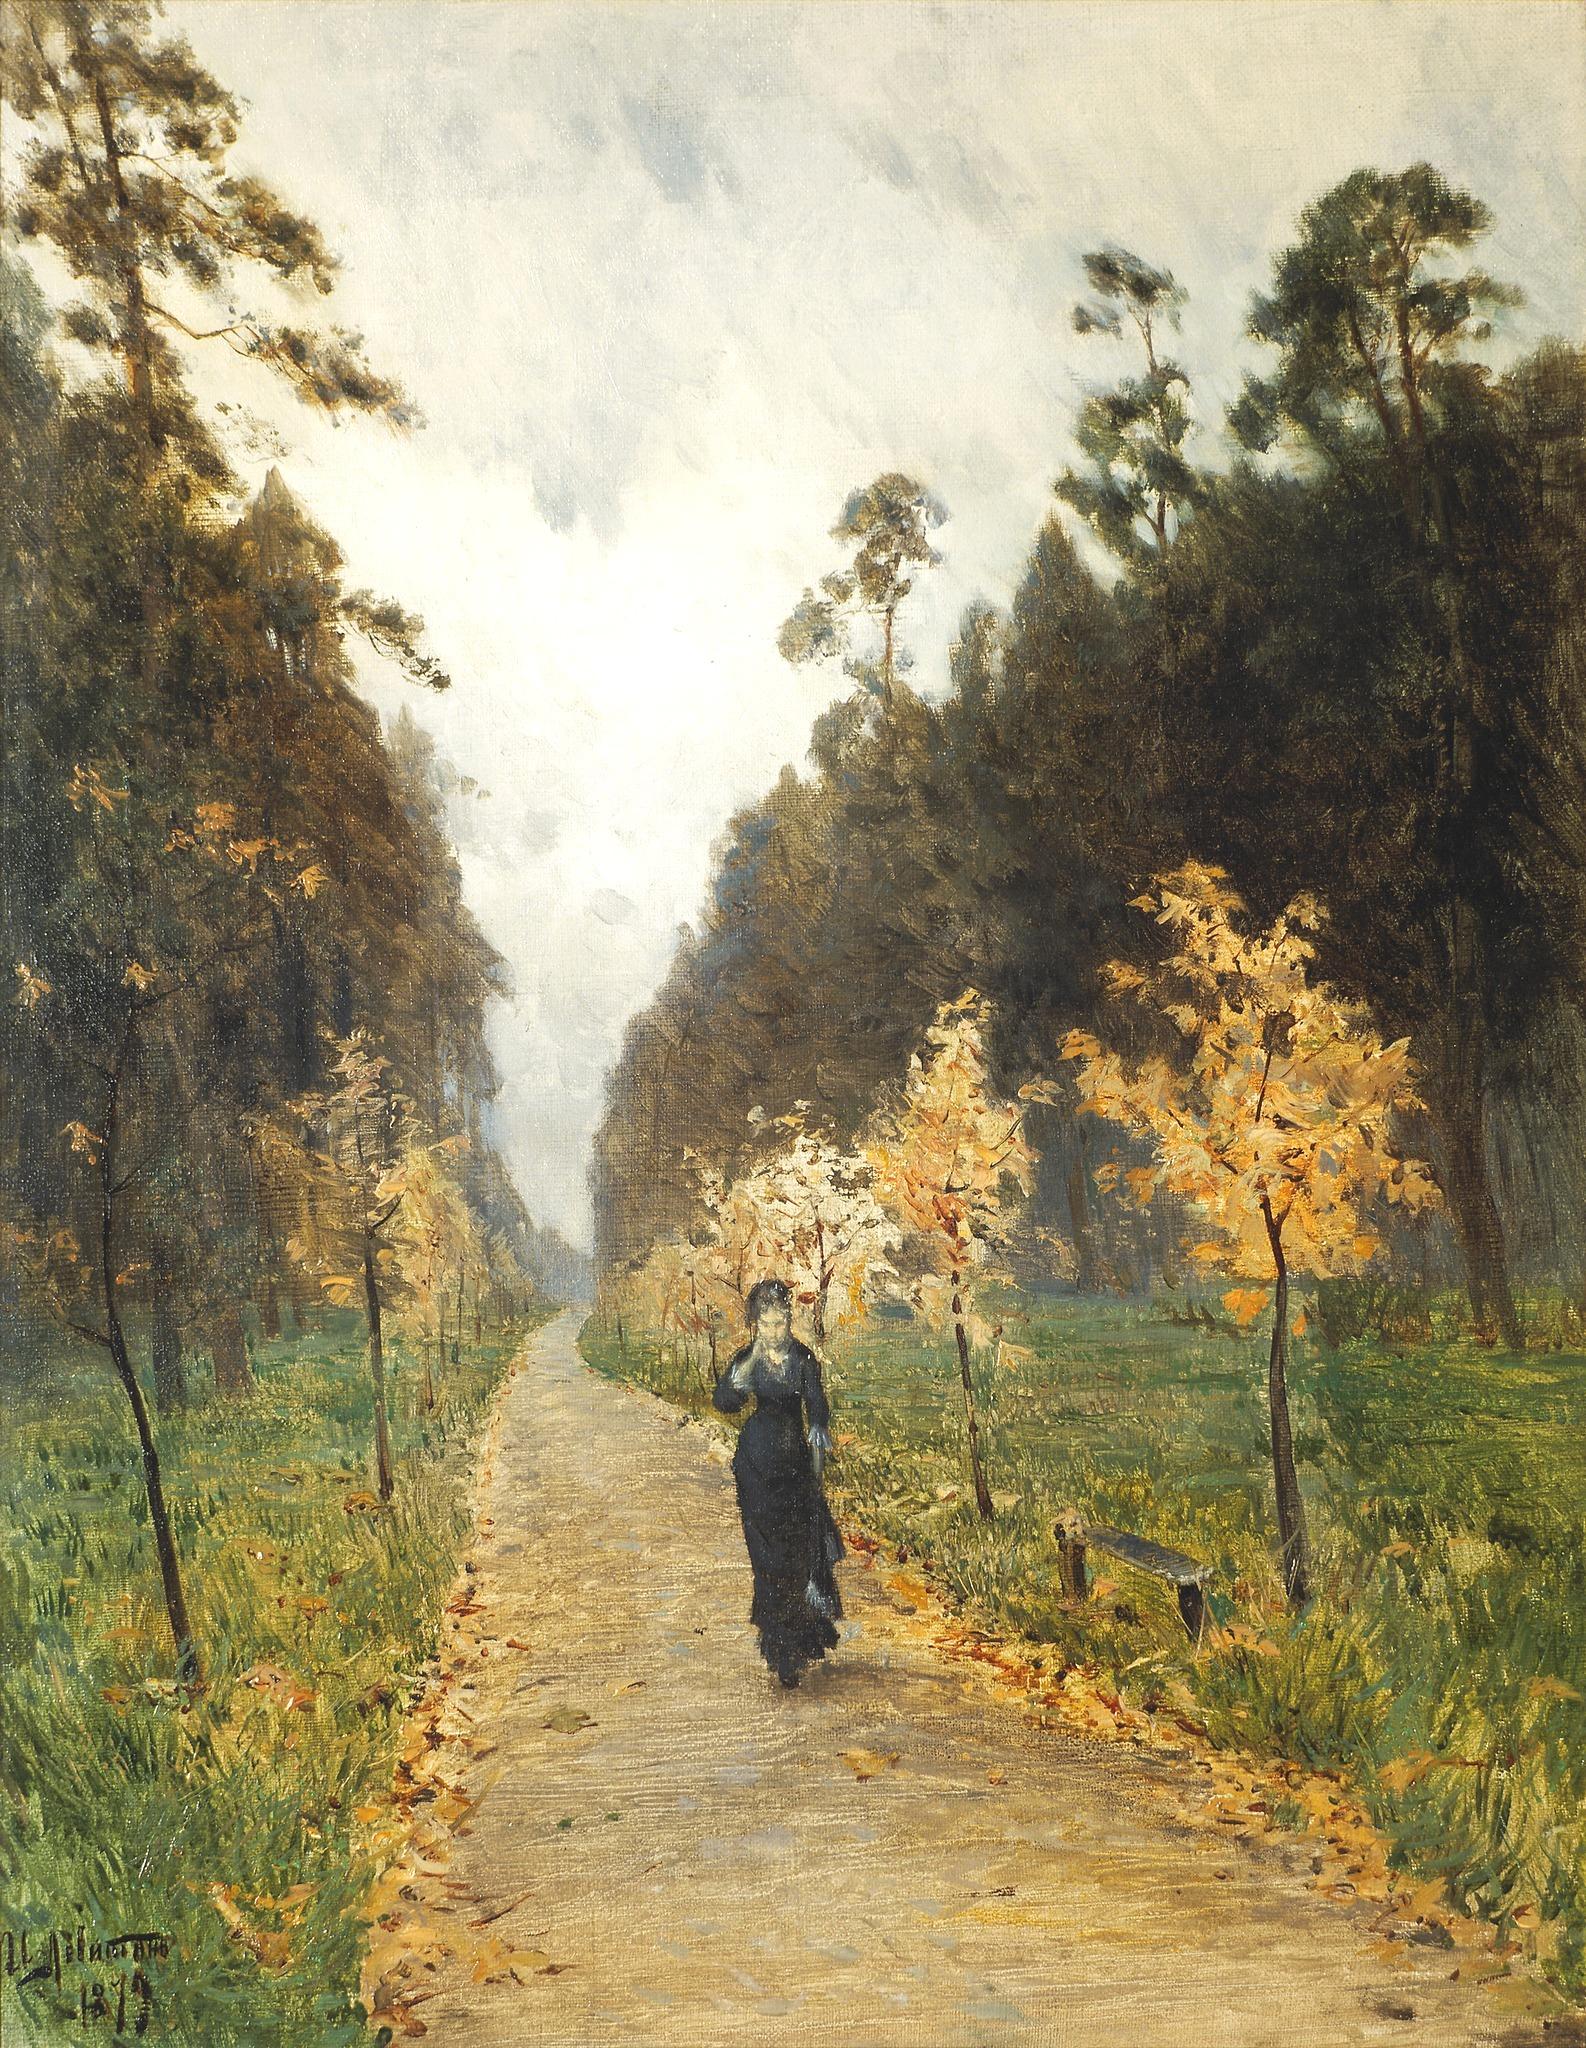 File:Levitan Sokolniki Autumn 1879.jpg